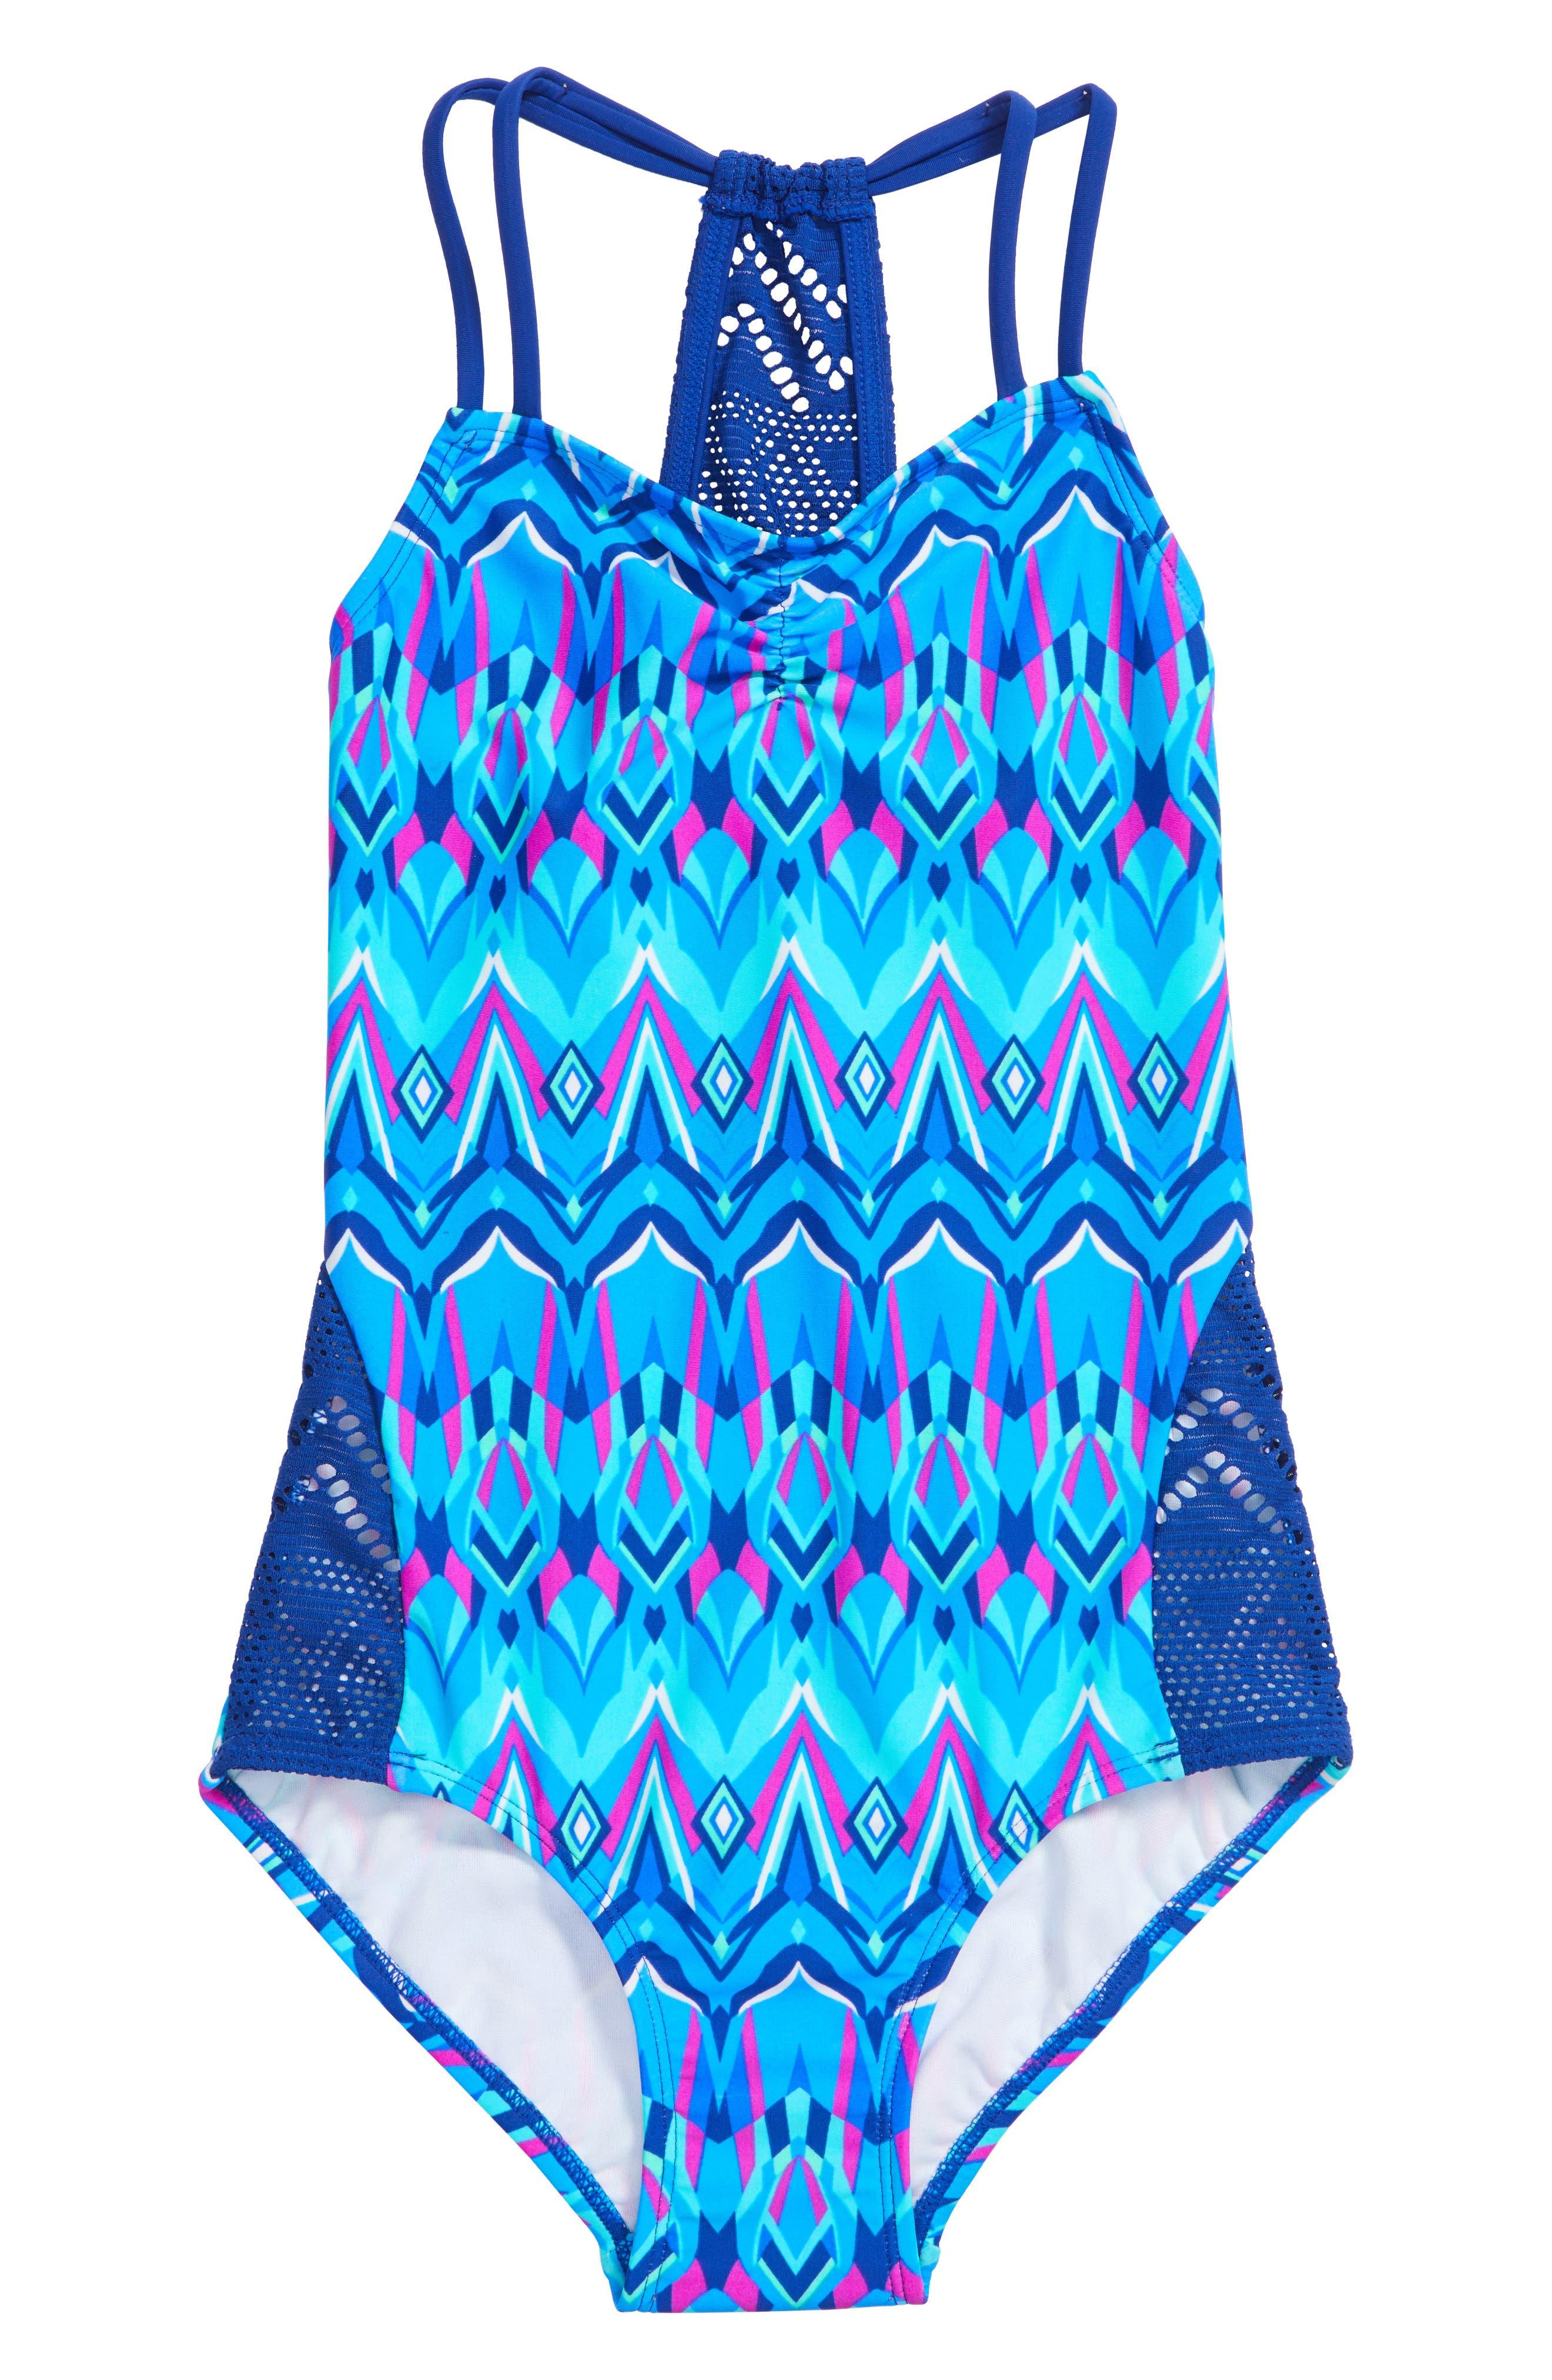 Kaleidoscope One-Piece Swimsuit,                             Main thumbnail 1, color,                             476